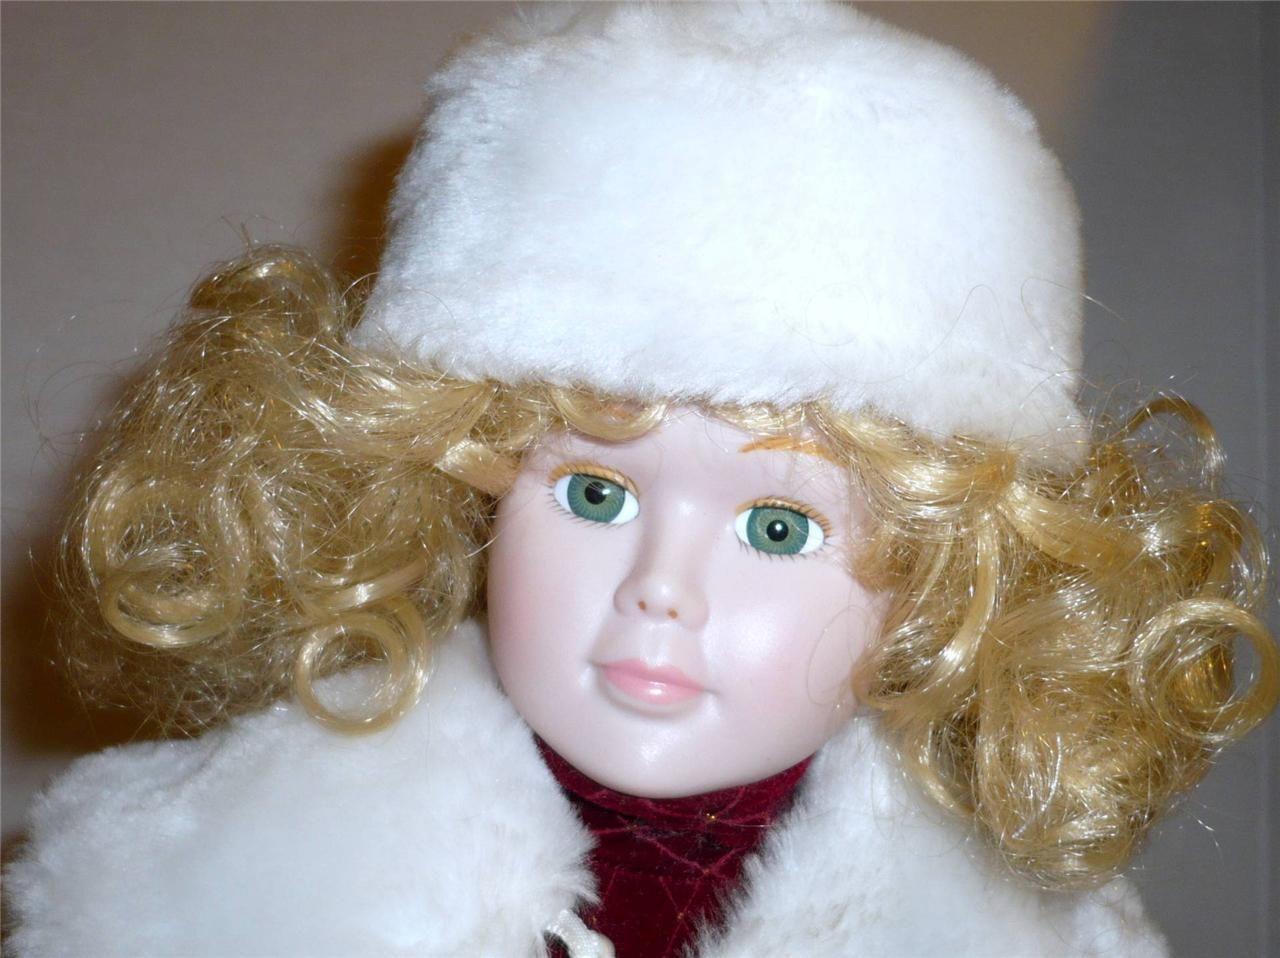 House Of Lloyd Doll: 33 listings